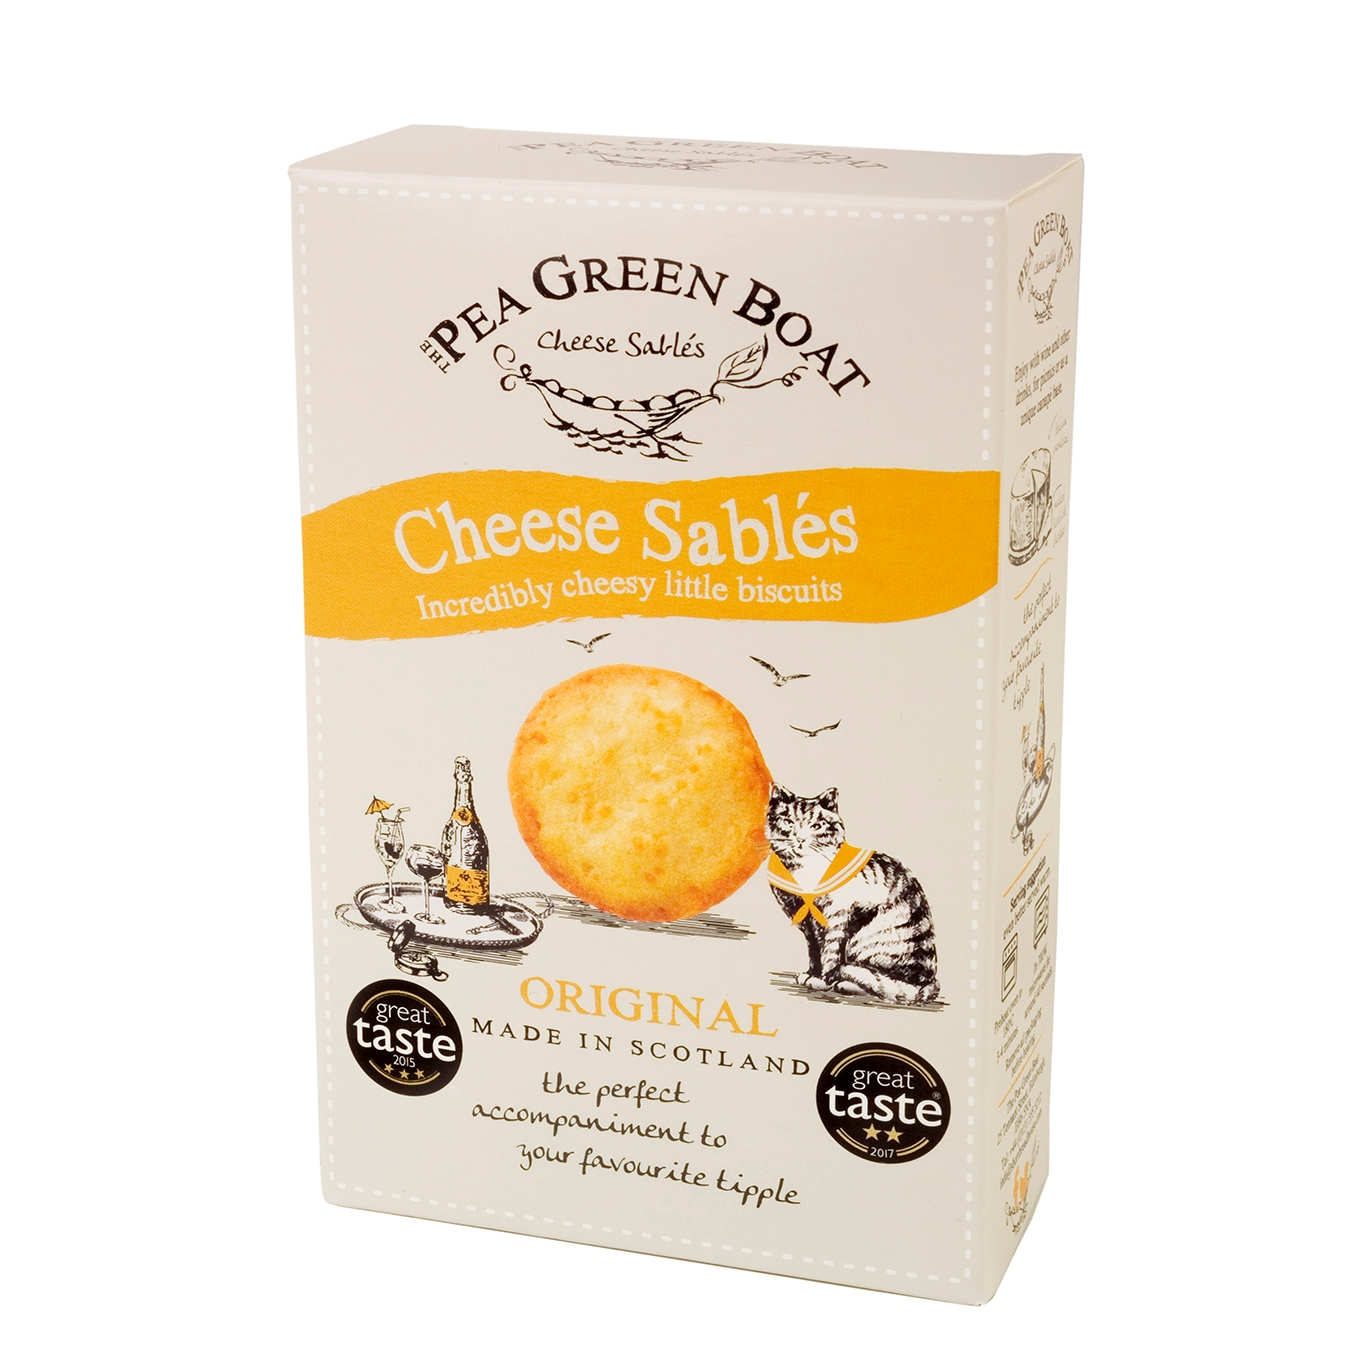 Pea Green Boat Cheese Sablés 80g Harvey Nichols